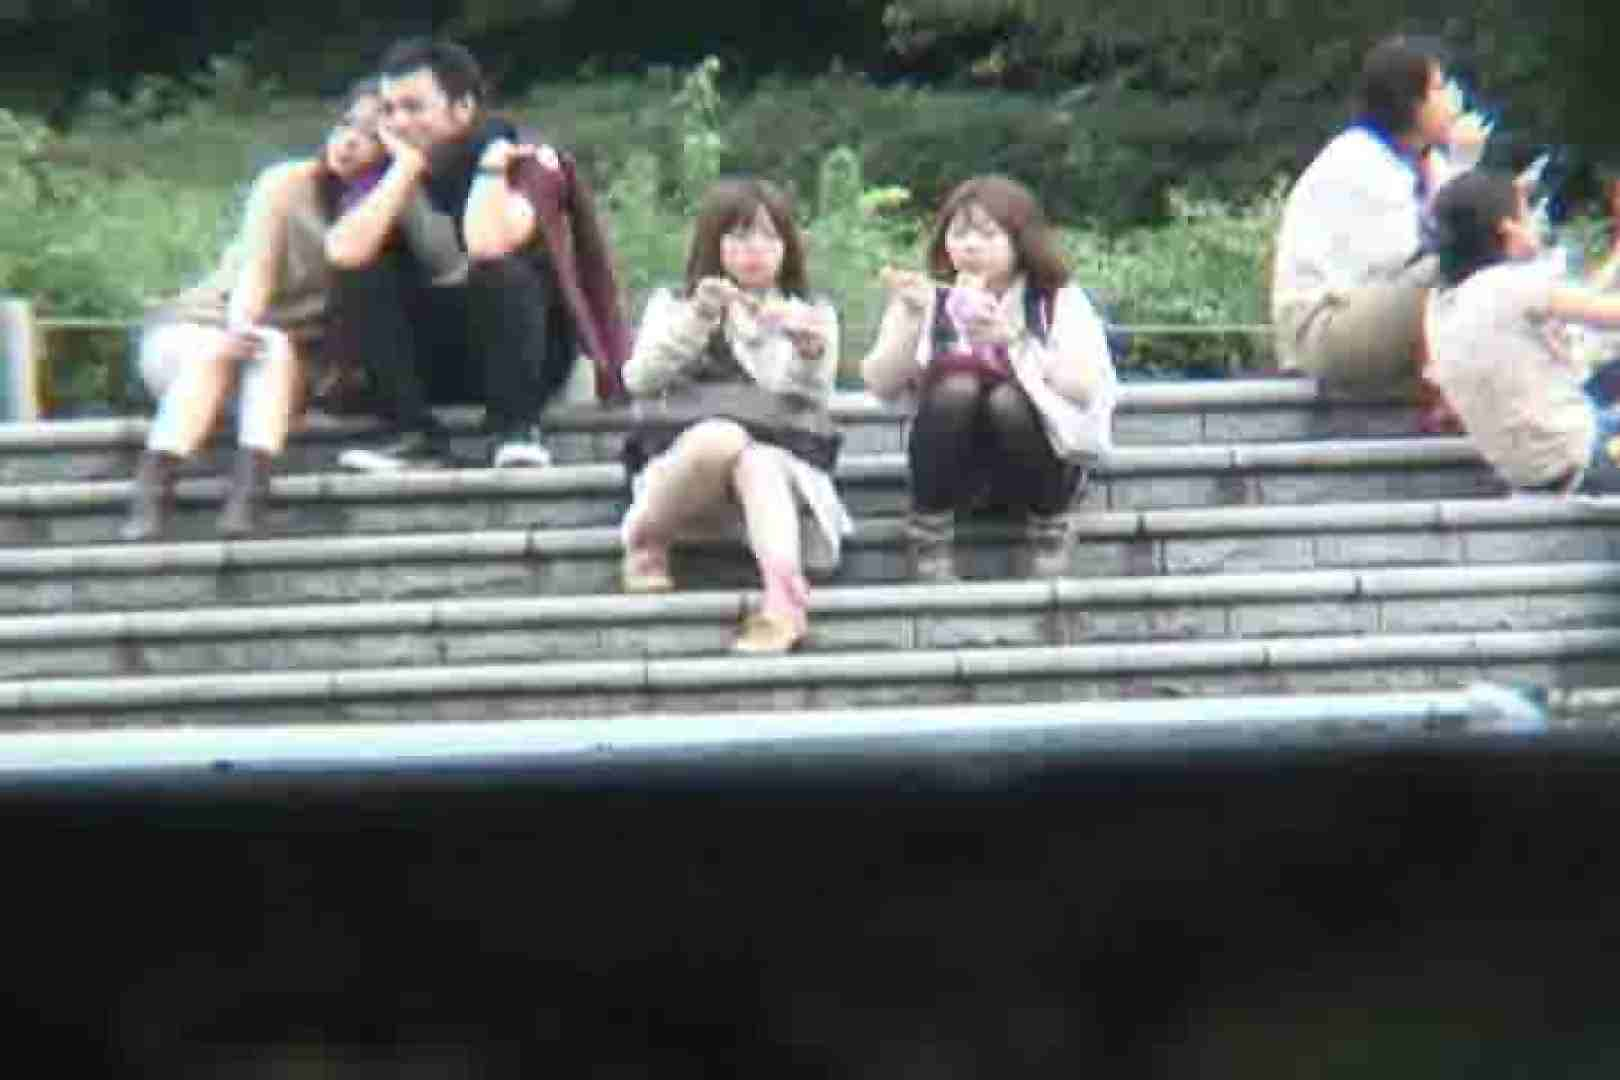 超最新版!春夏秋冬 vol.04 現役ギャル  97pic 88